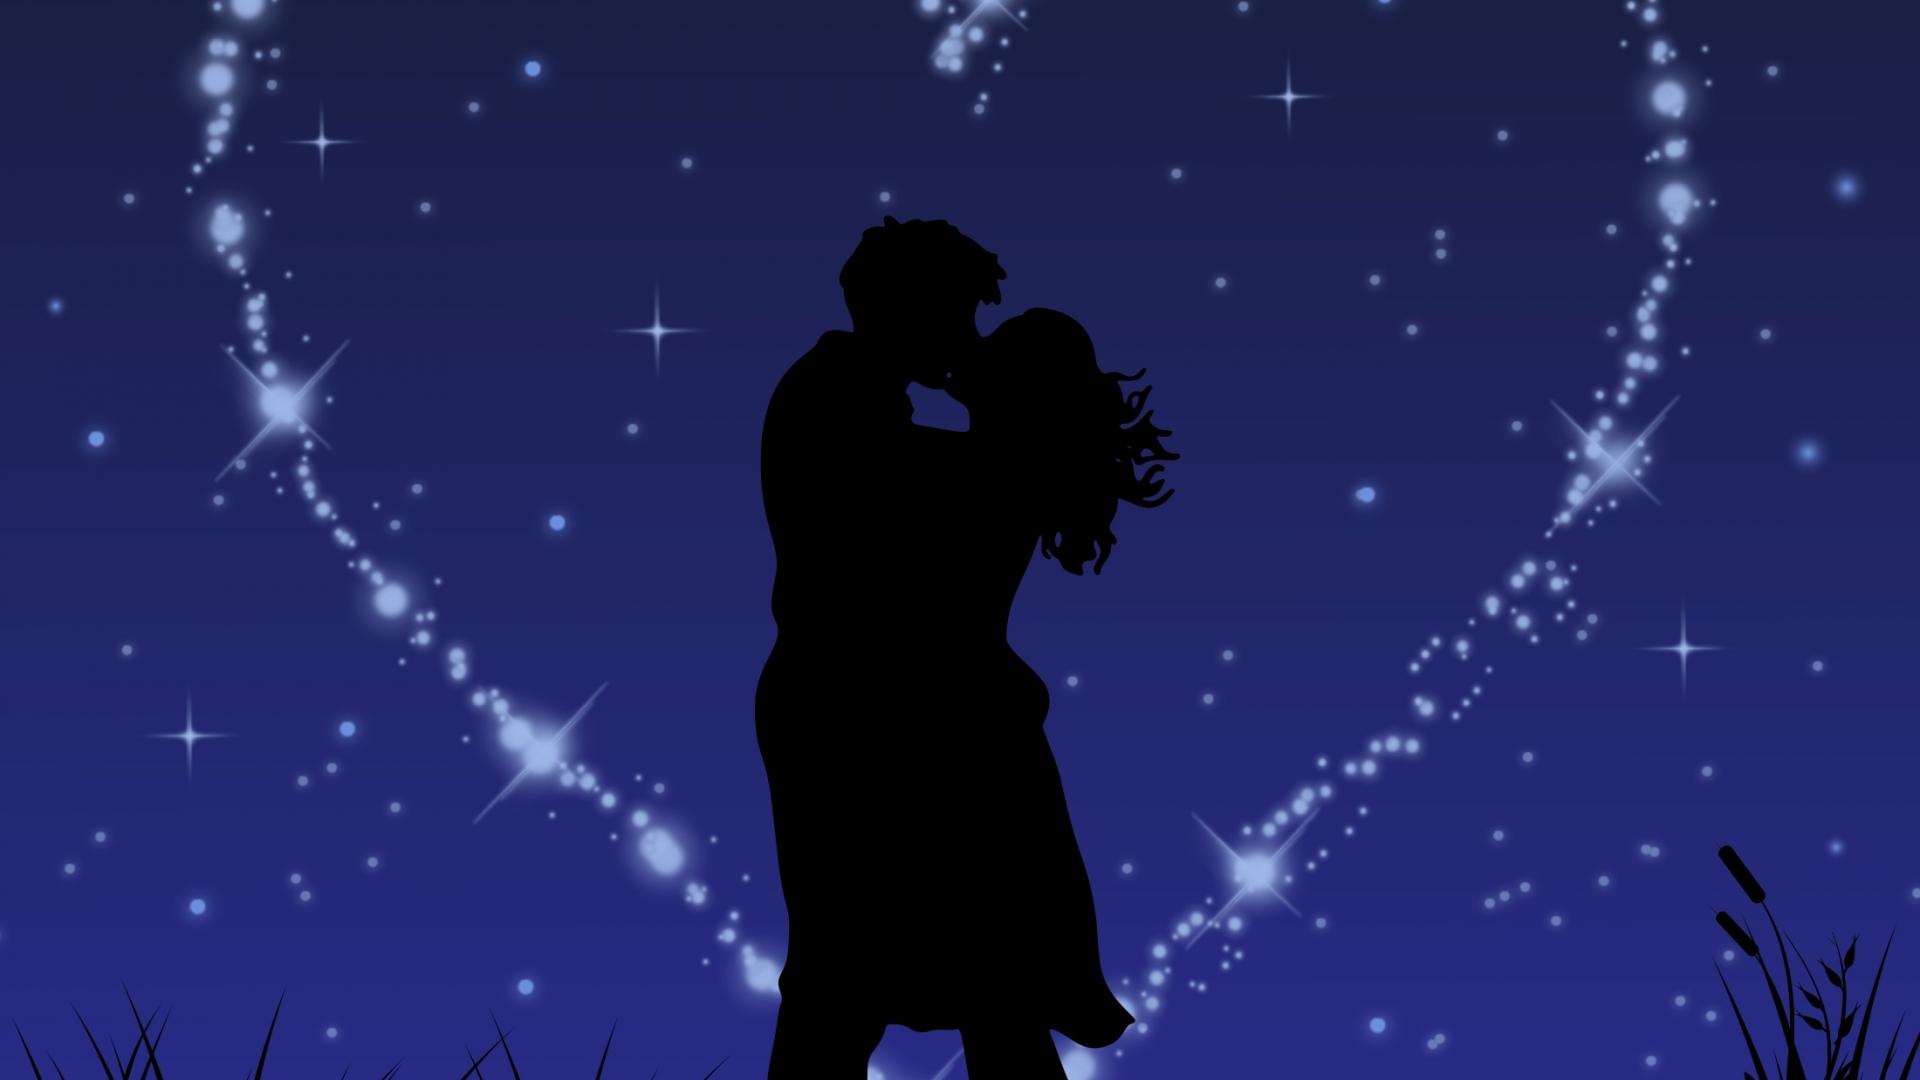 Download 1920x1080 Wallpaper Couple Love Kiss Stars Glitter